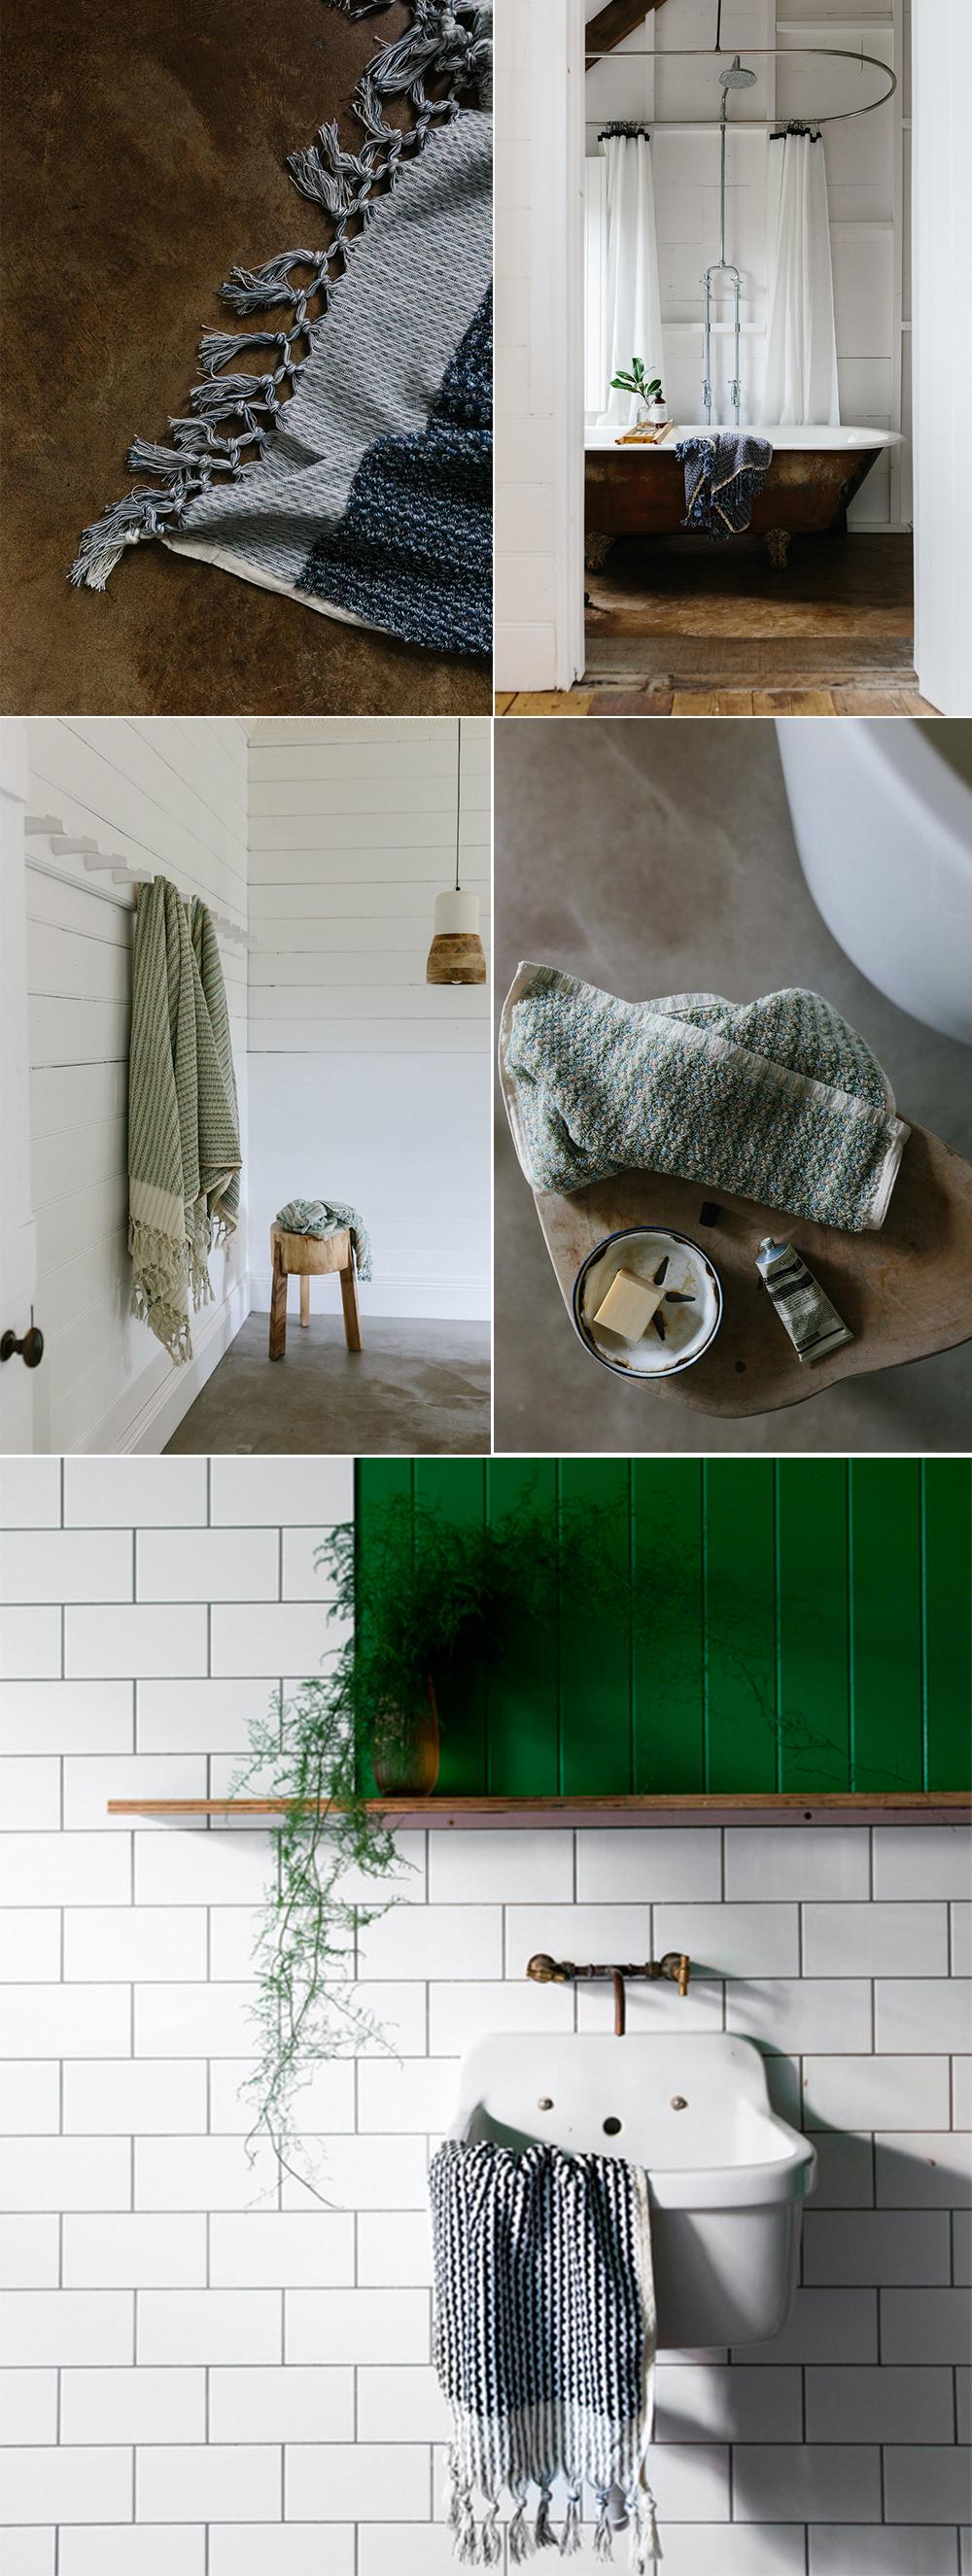 Loom Towel_Manonbis